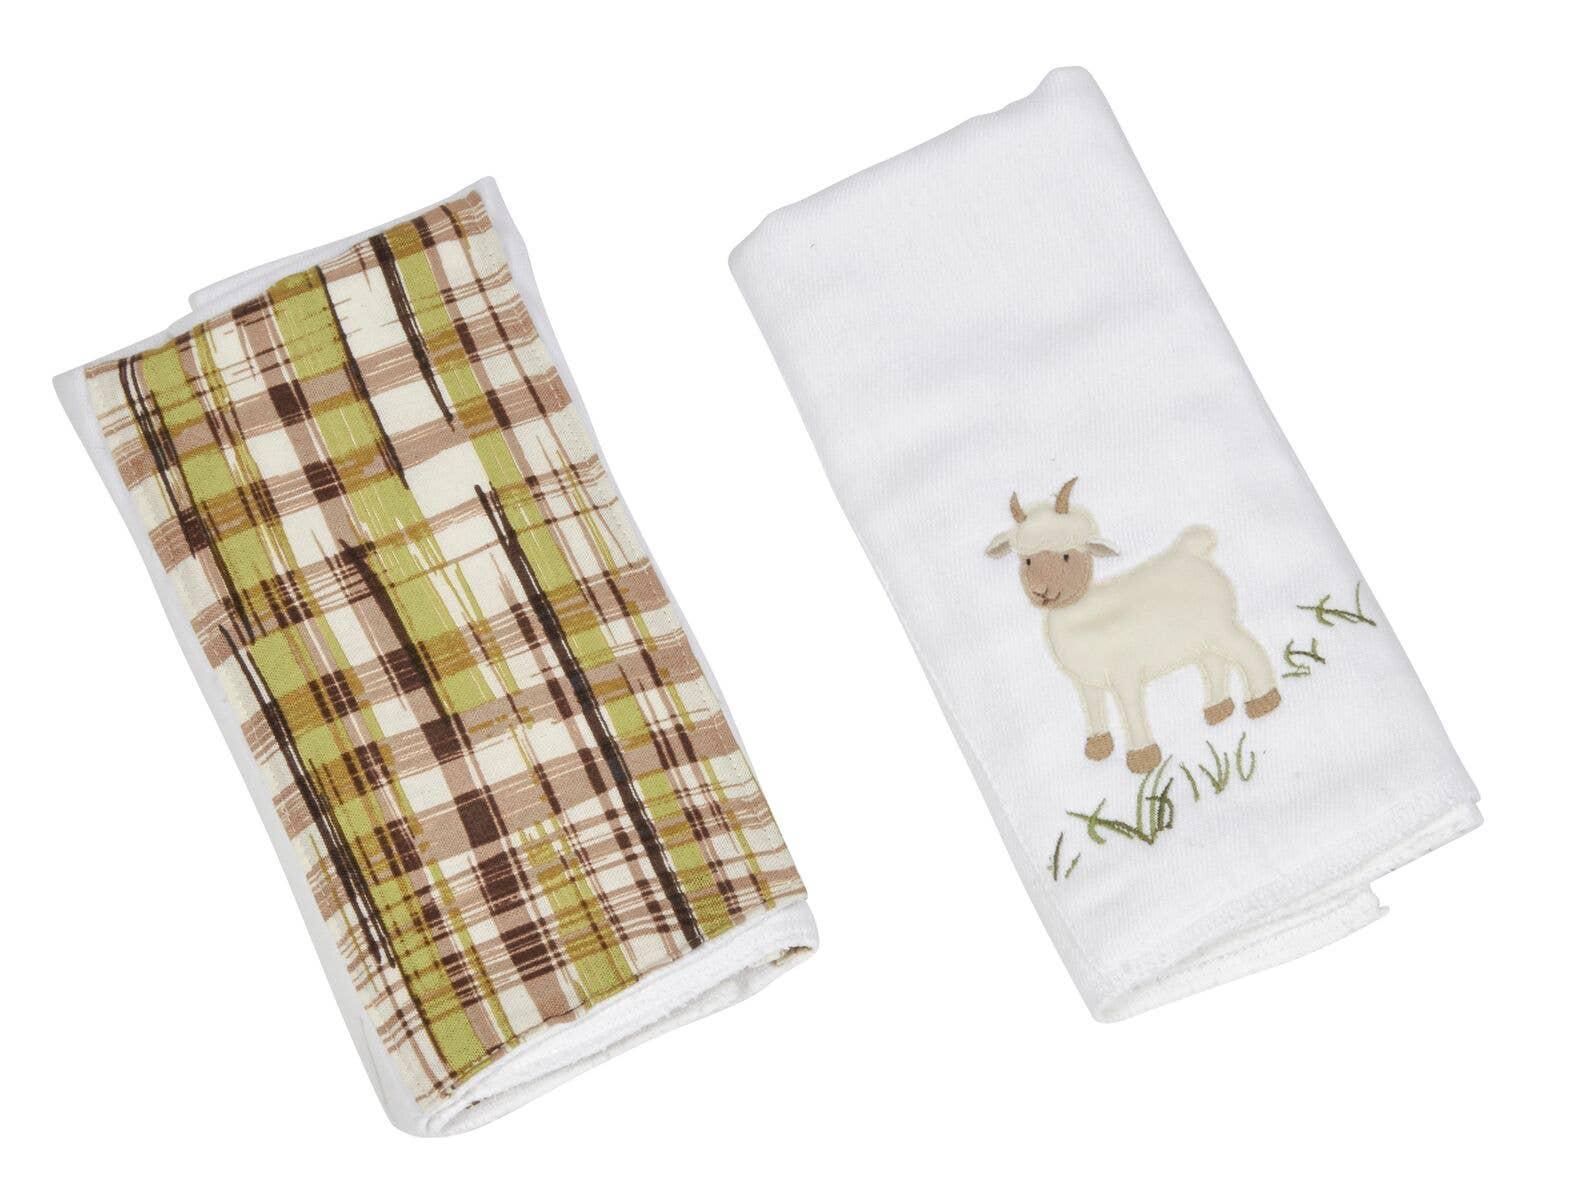 Maison Chic Double Burp Cloth Gift Set Cocoa The Bear